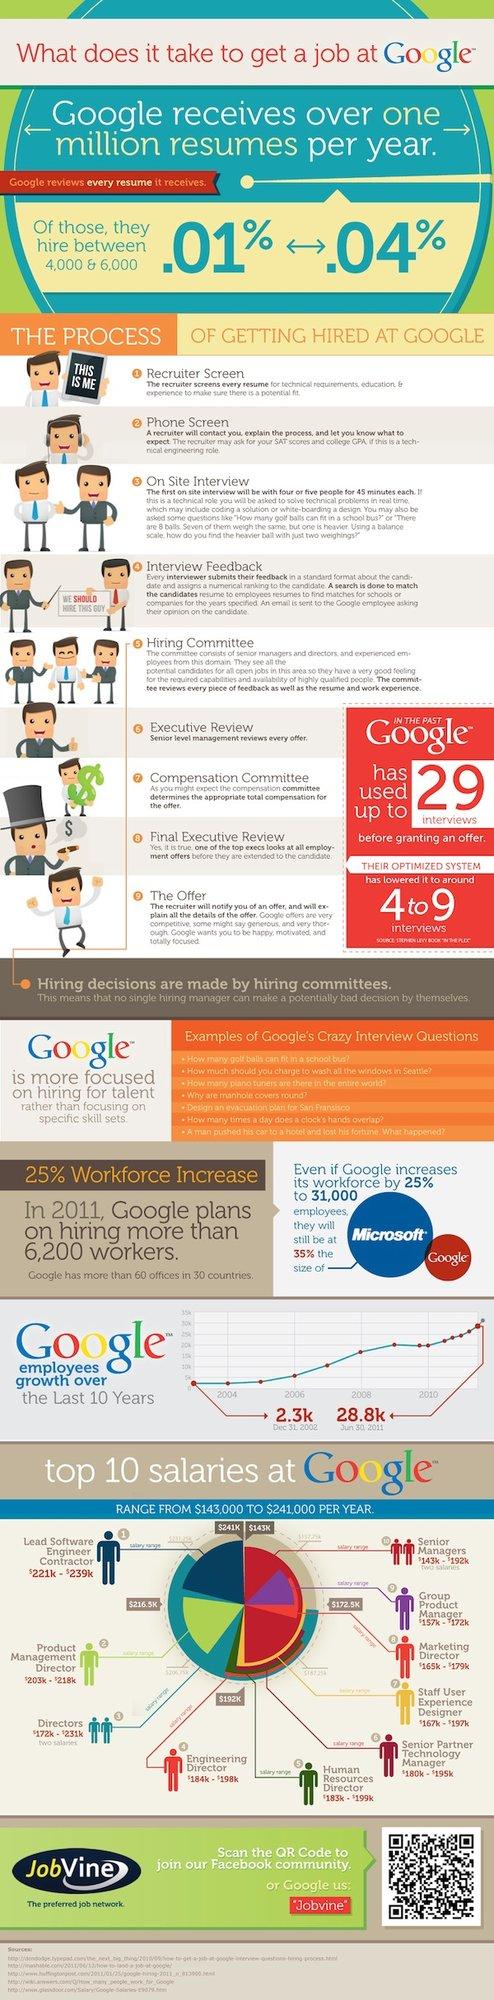 Google复杂的招聘流程(图)